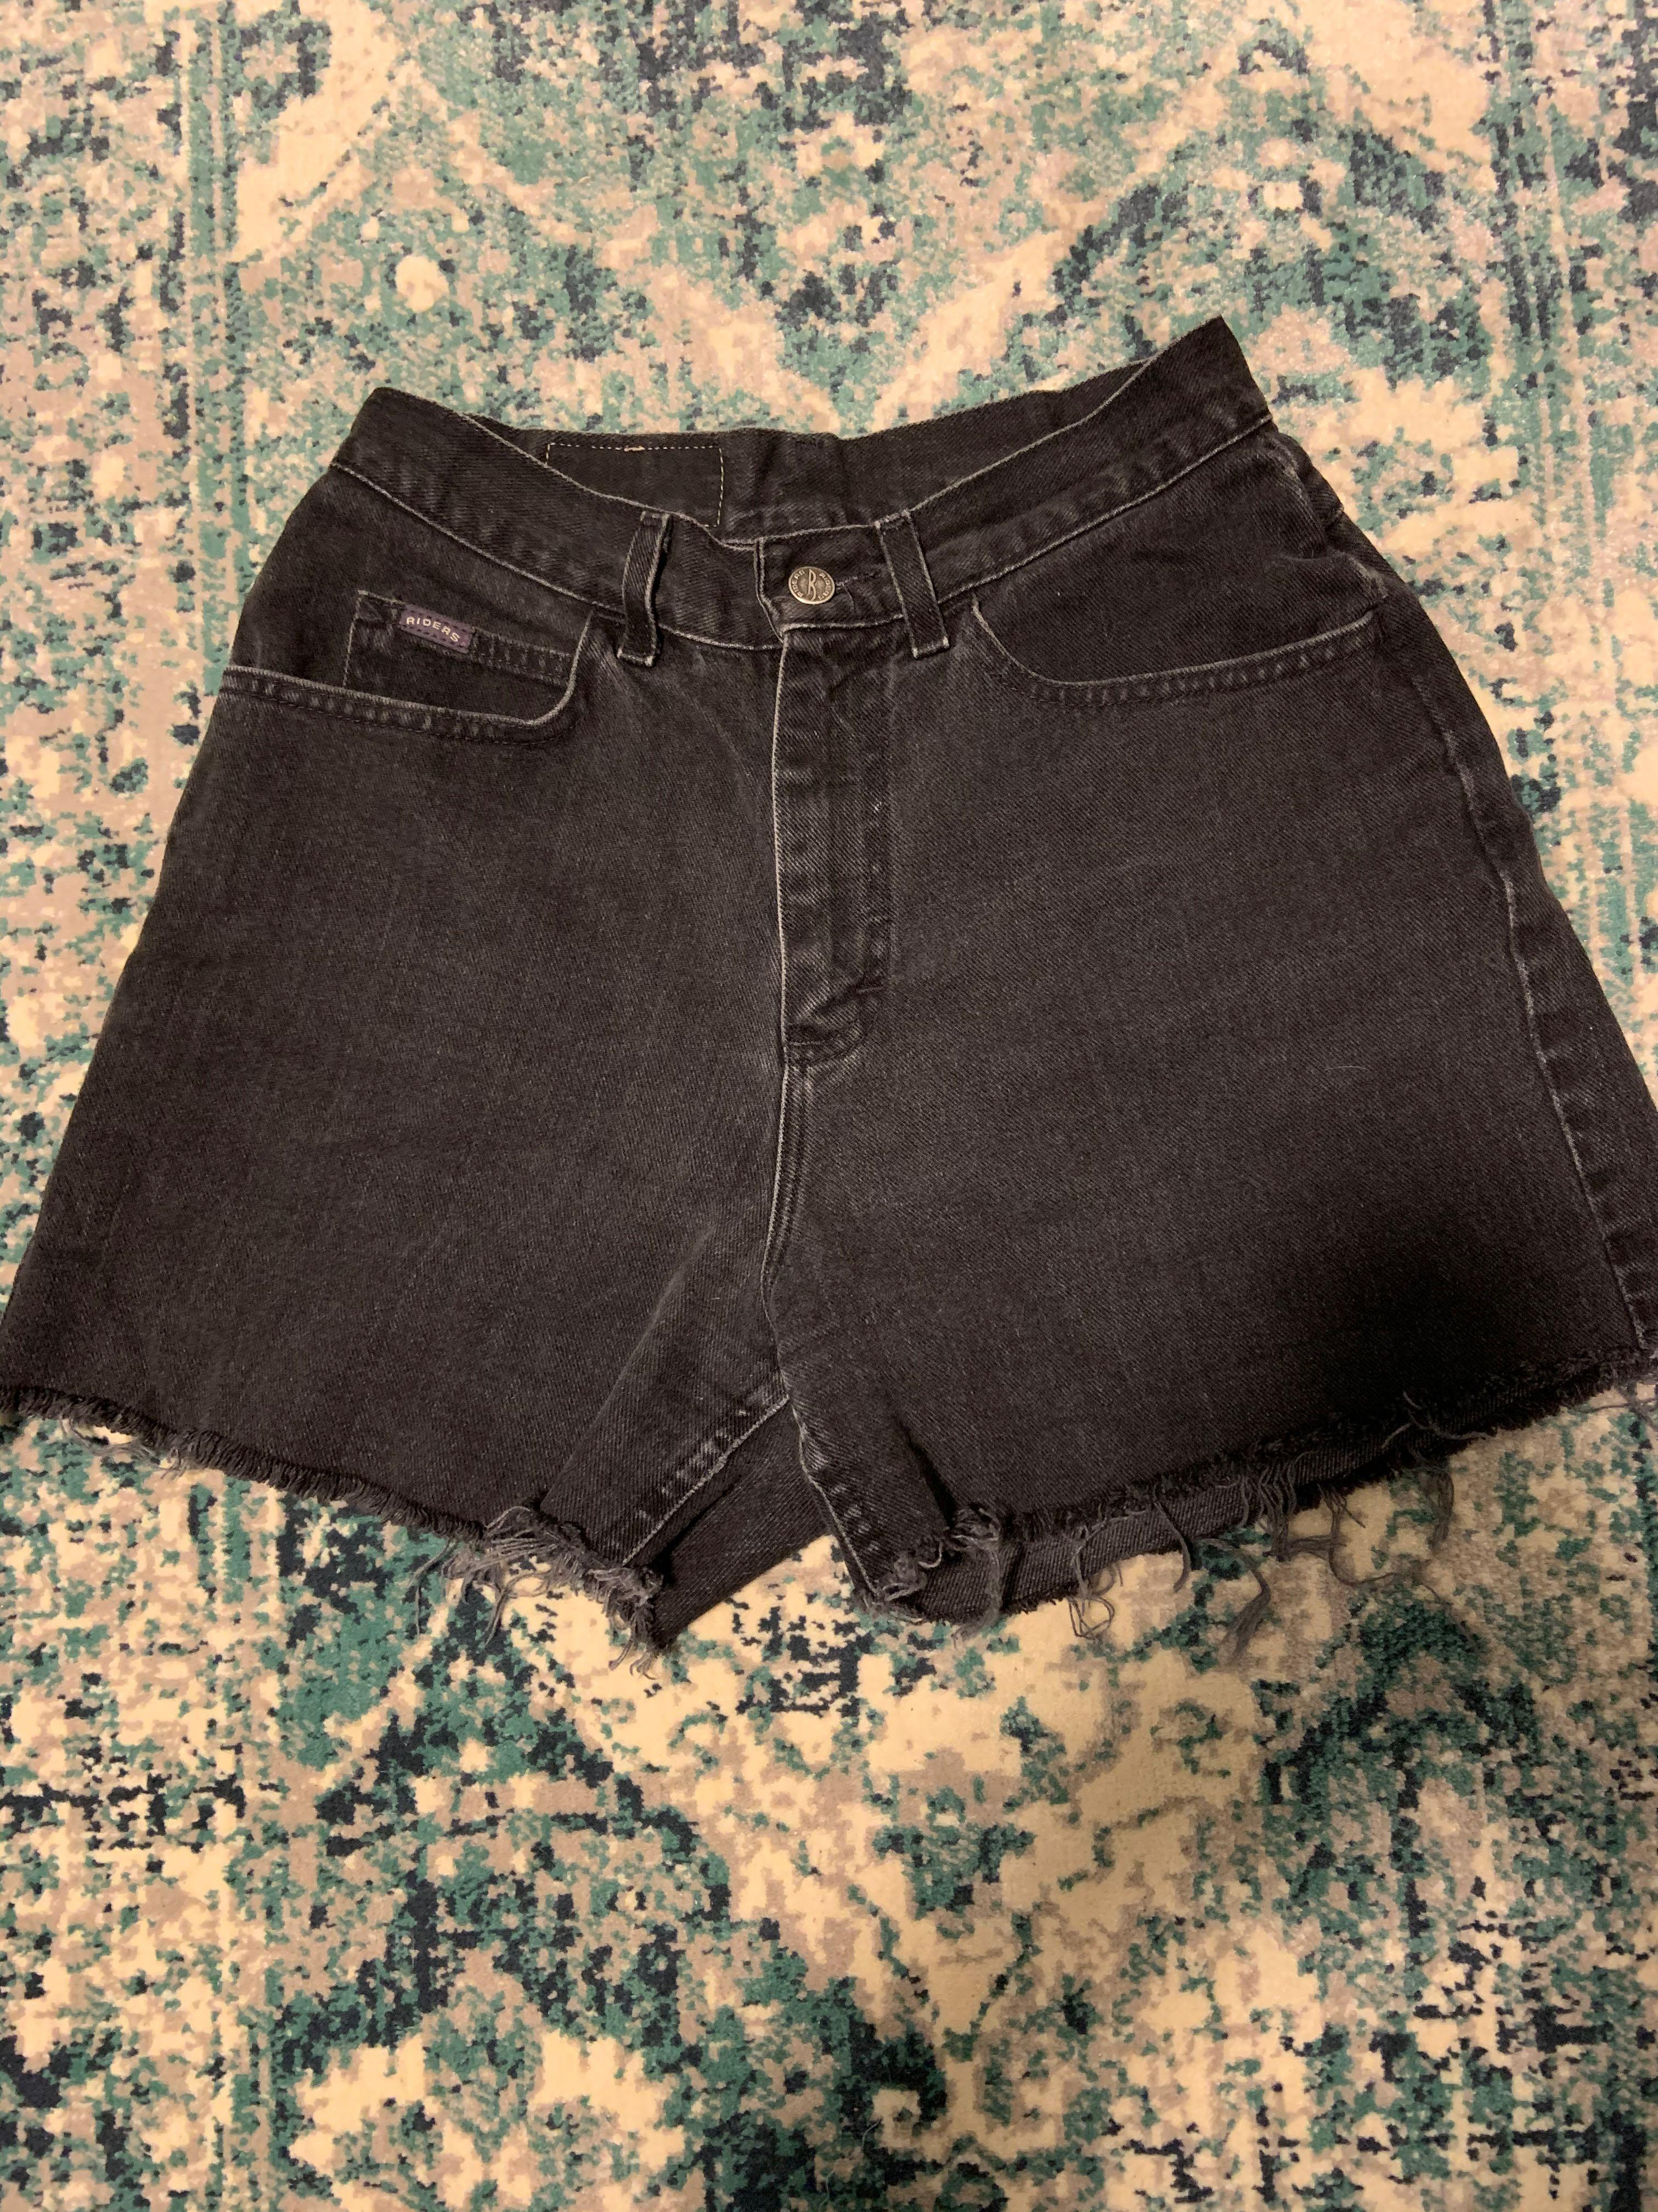 Vintage Riders dark cut off denim shorts